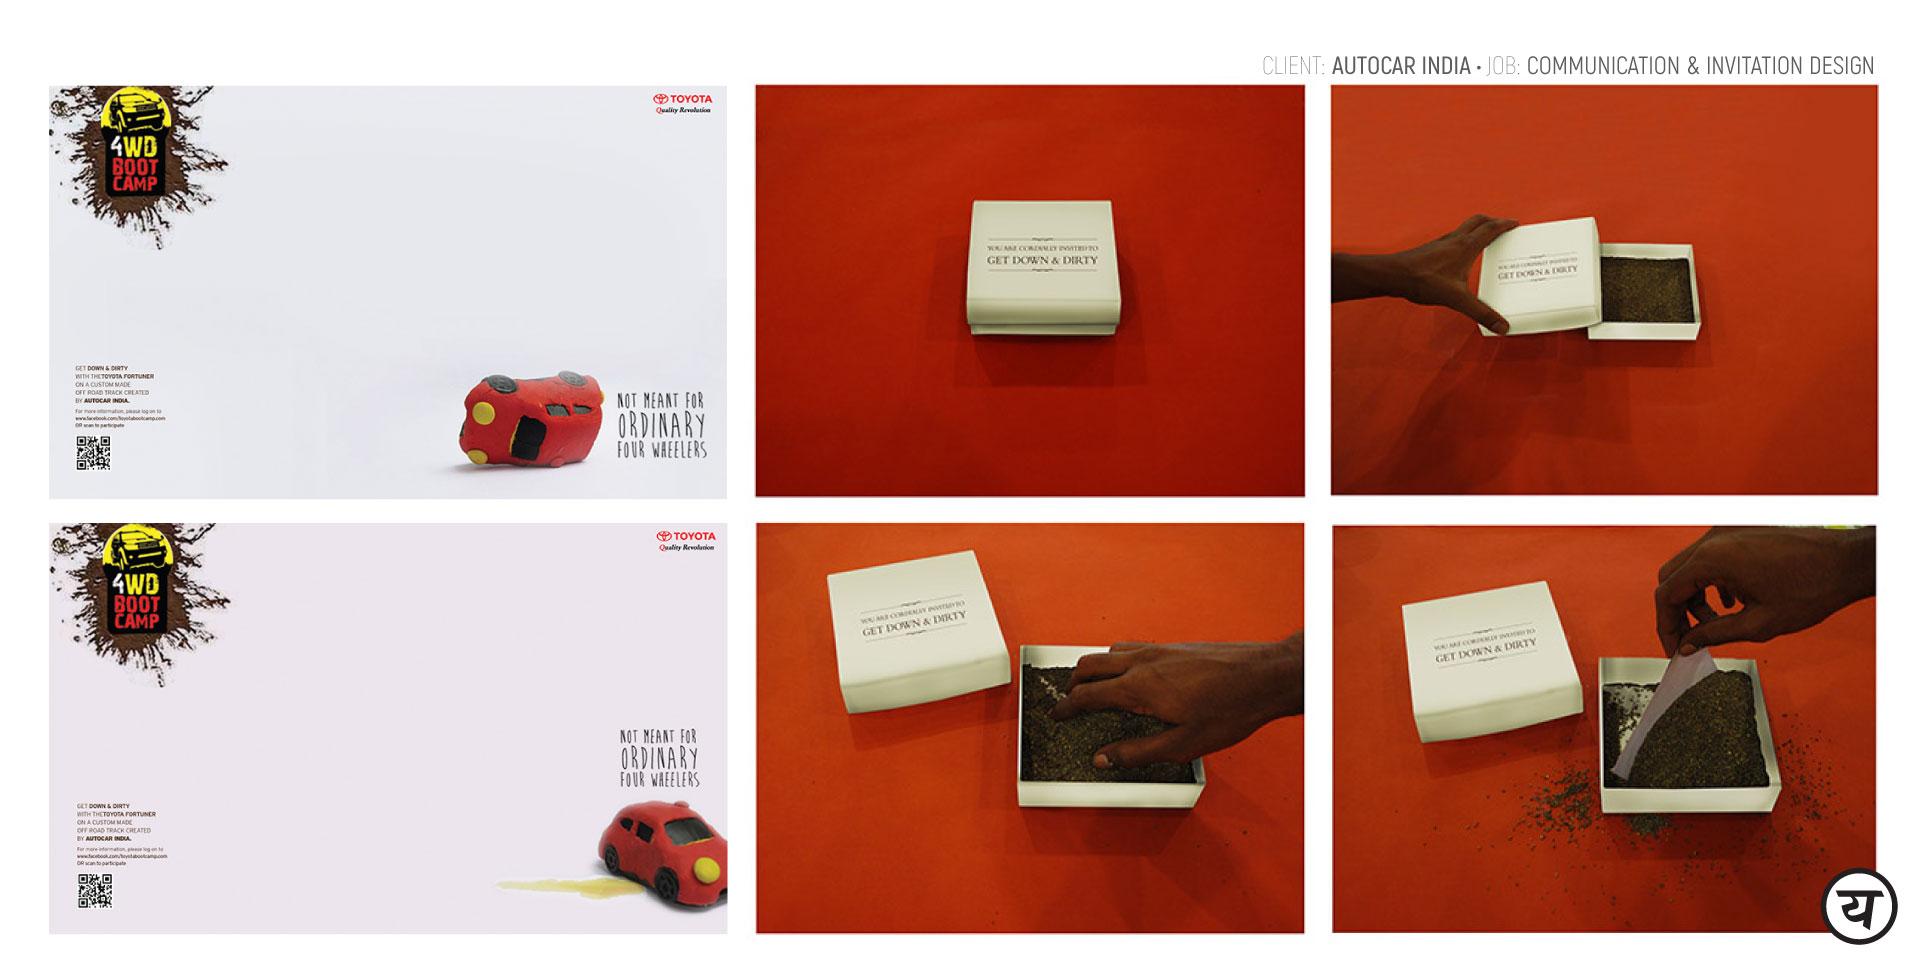 YesYesWhyNot_Communication-Design_Haymarket-#6_04.08.19